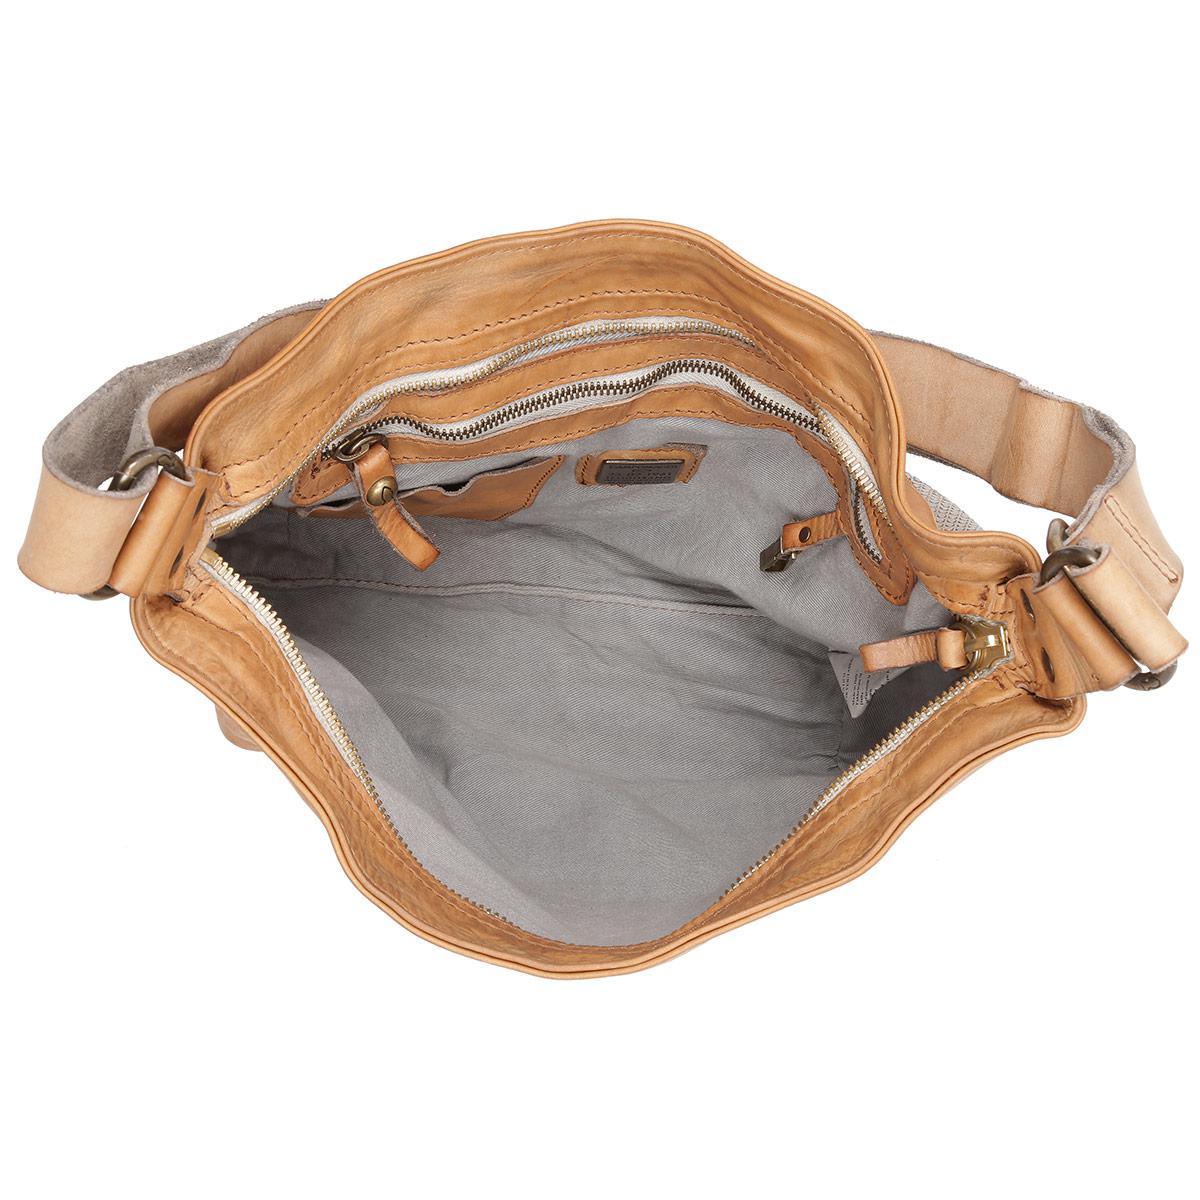 172bd6b62aa8 Campomaggi Monospalla Vacchio Bucket Bag Pallino Metal Grigio Perla ...